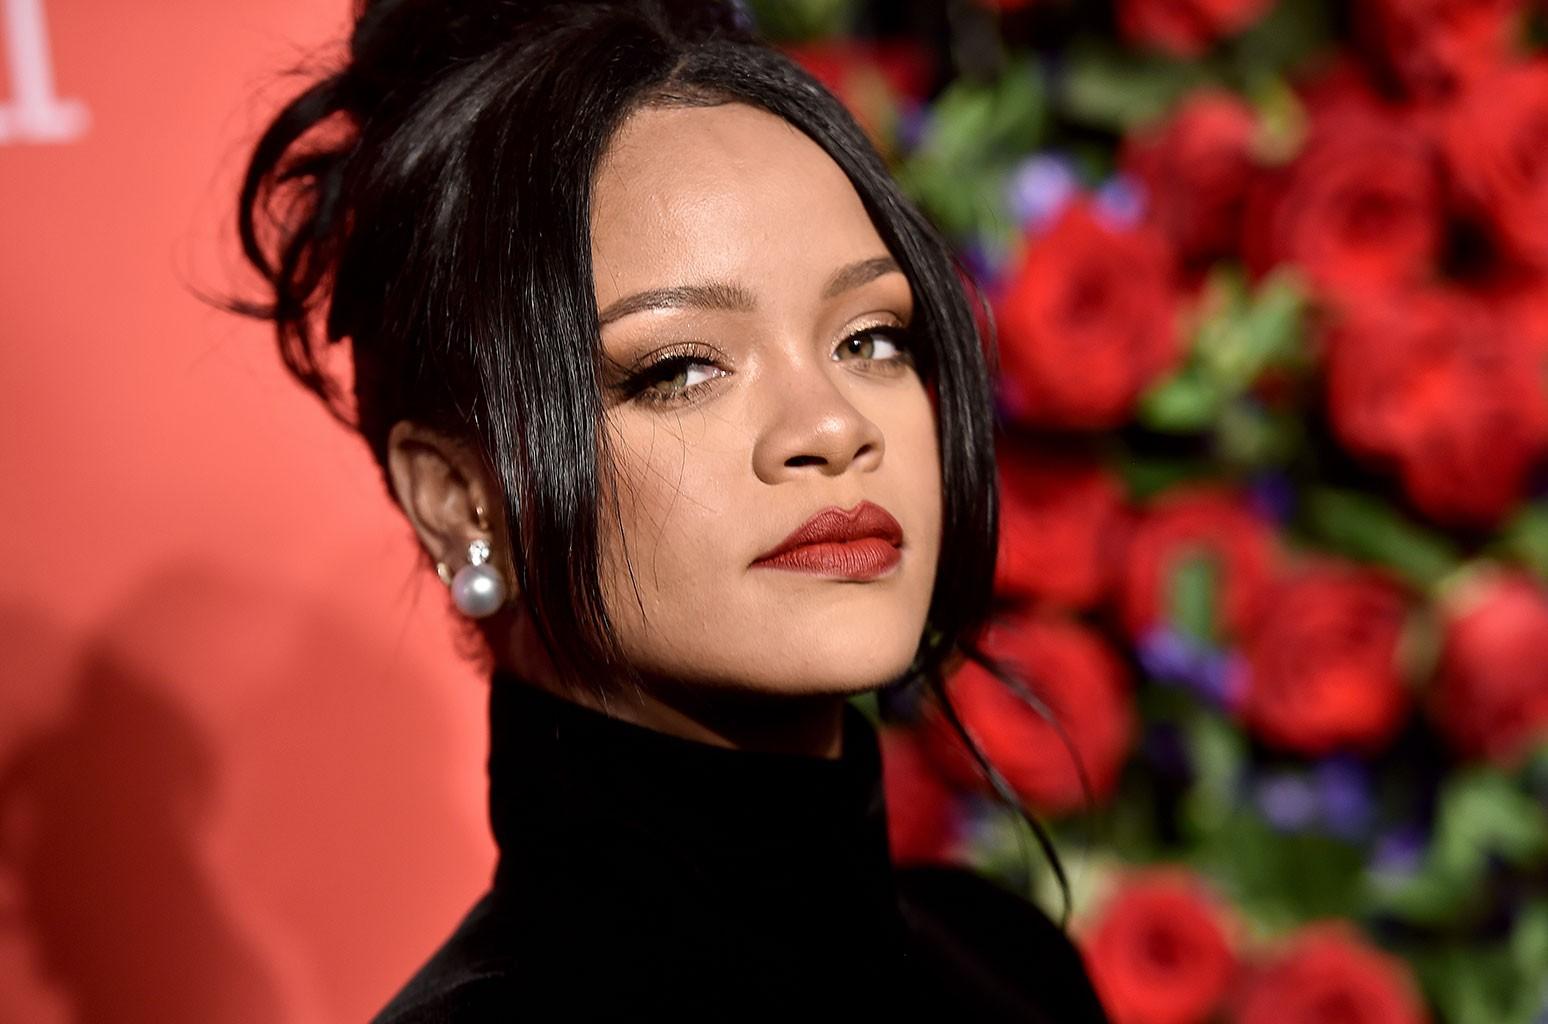 Rihanna Gets Cheeky In Brazil photo 2